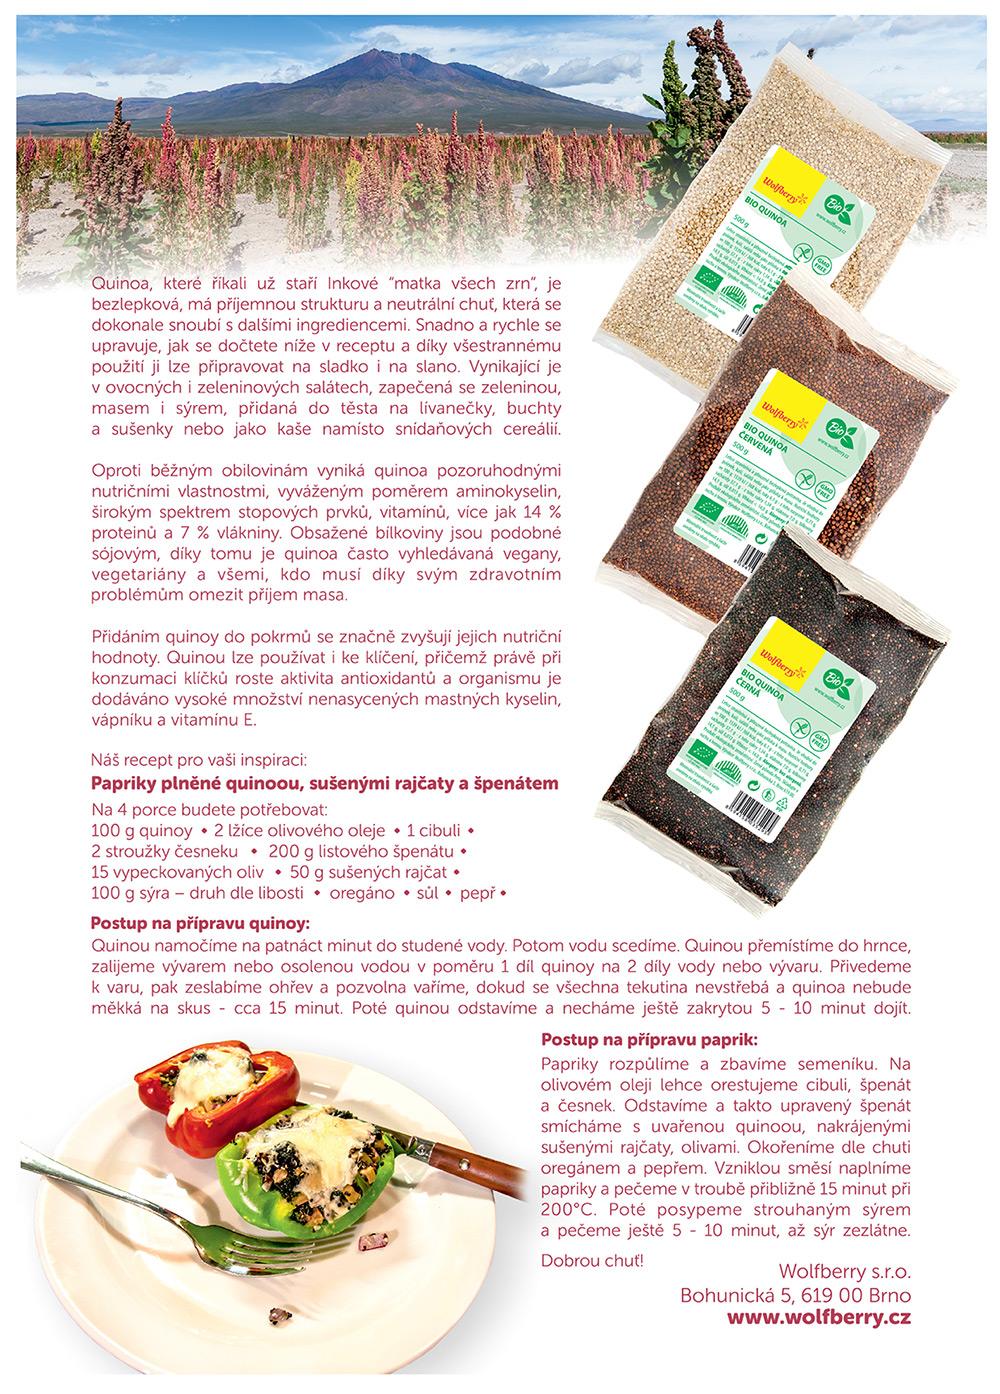 quinoa_wolfberry_web-2